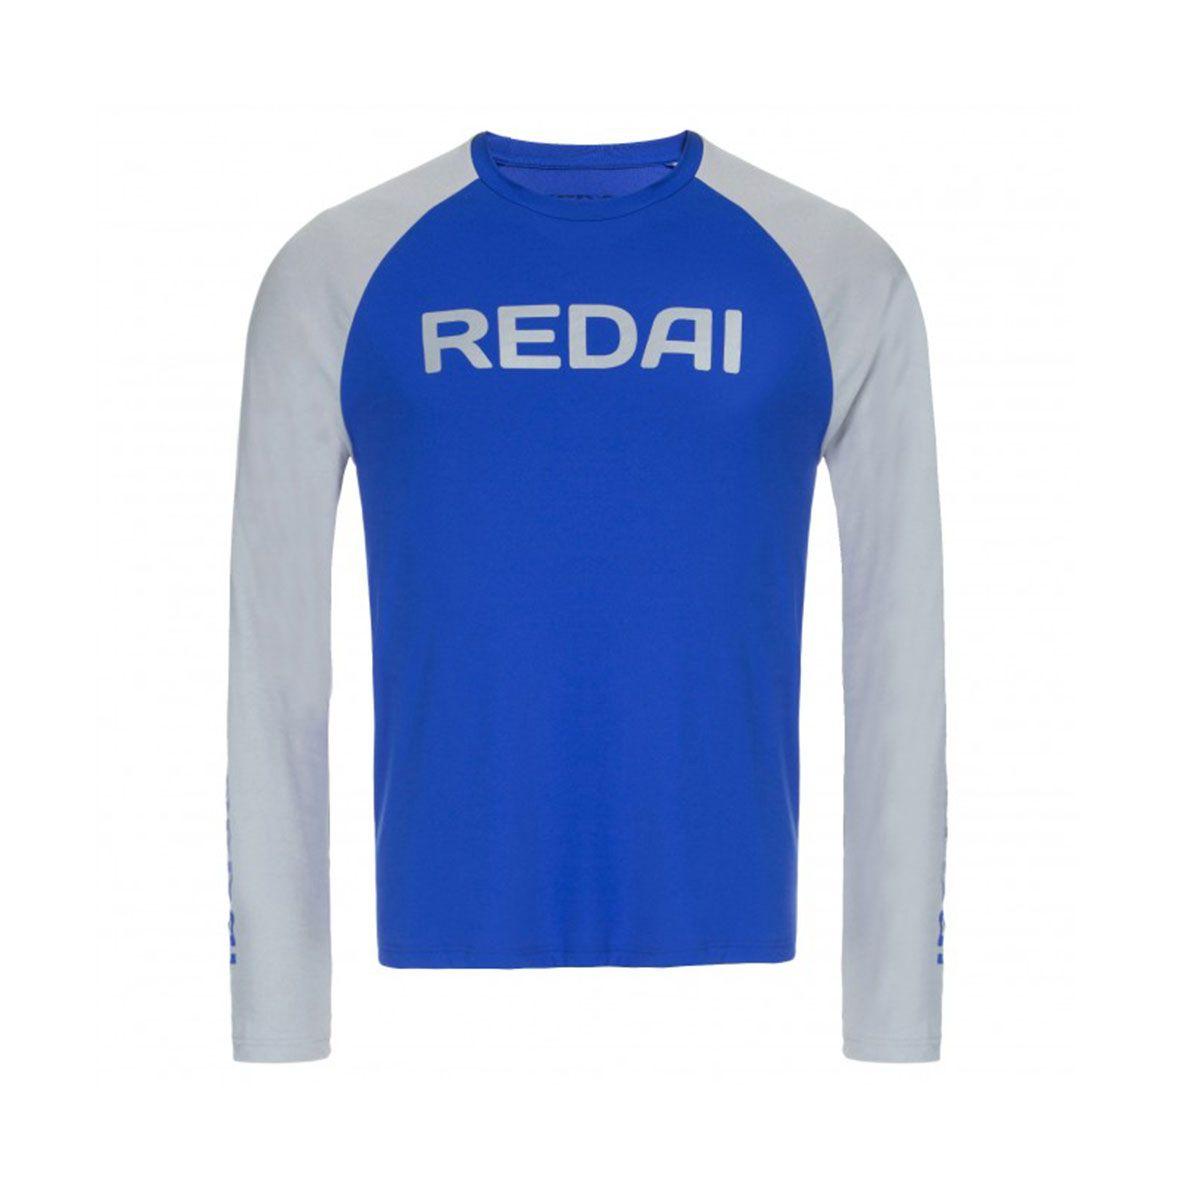 Camiseta Redai Performance Masculina Raglan Oceano